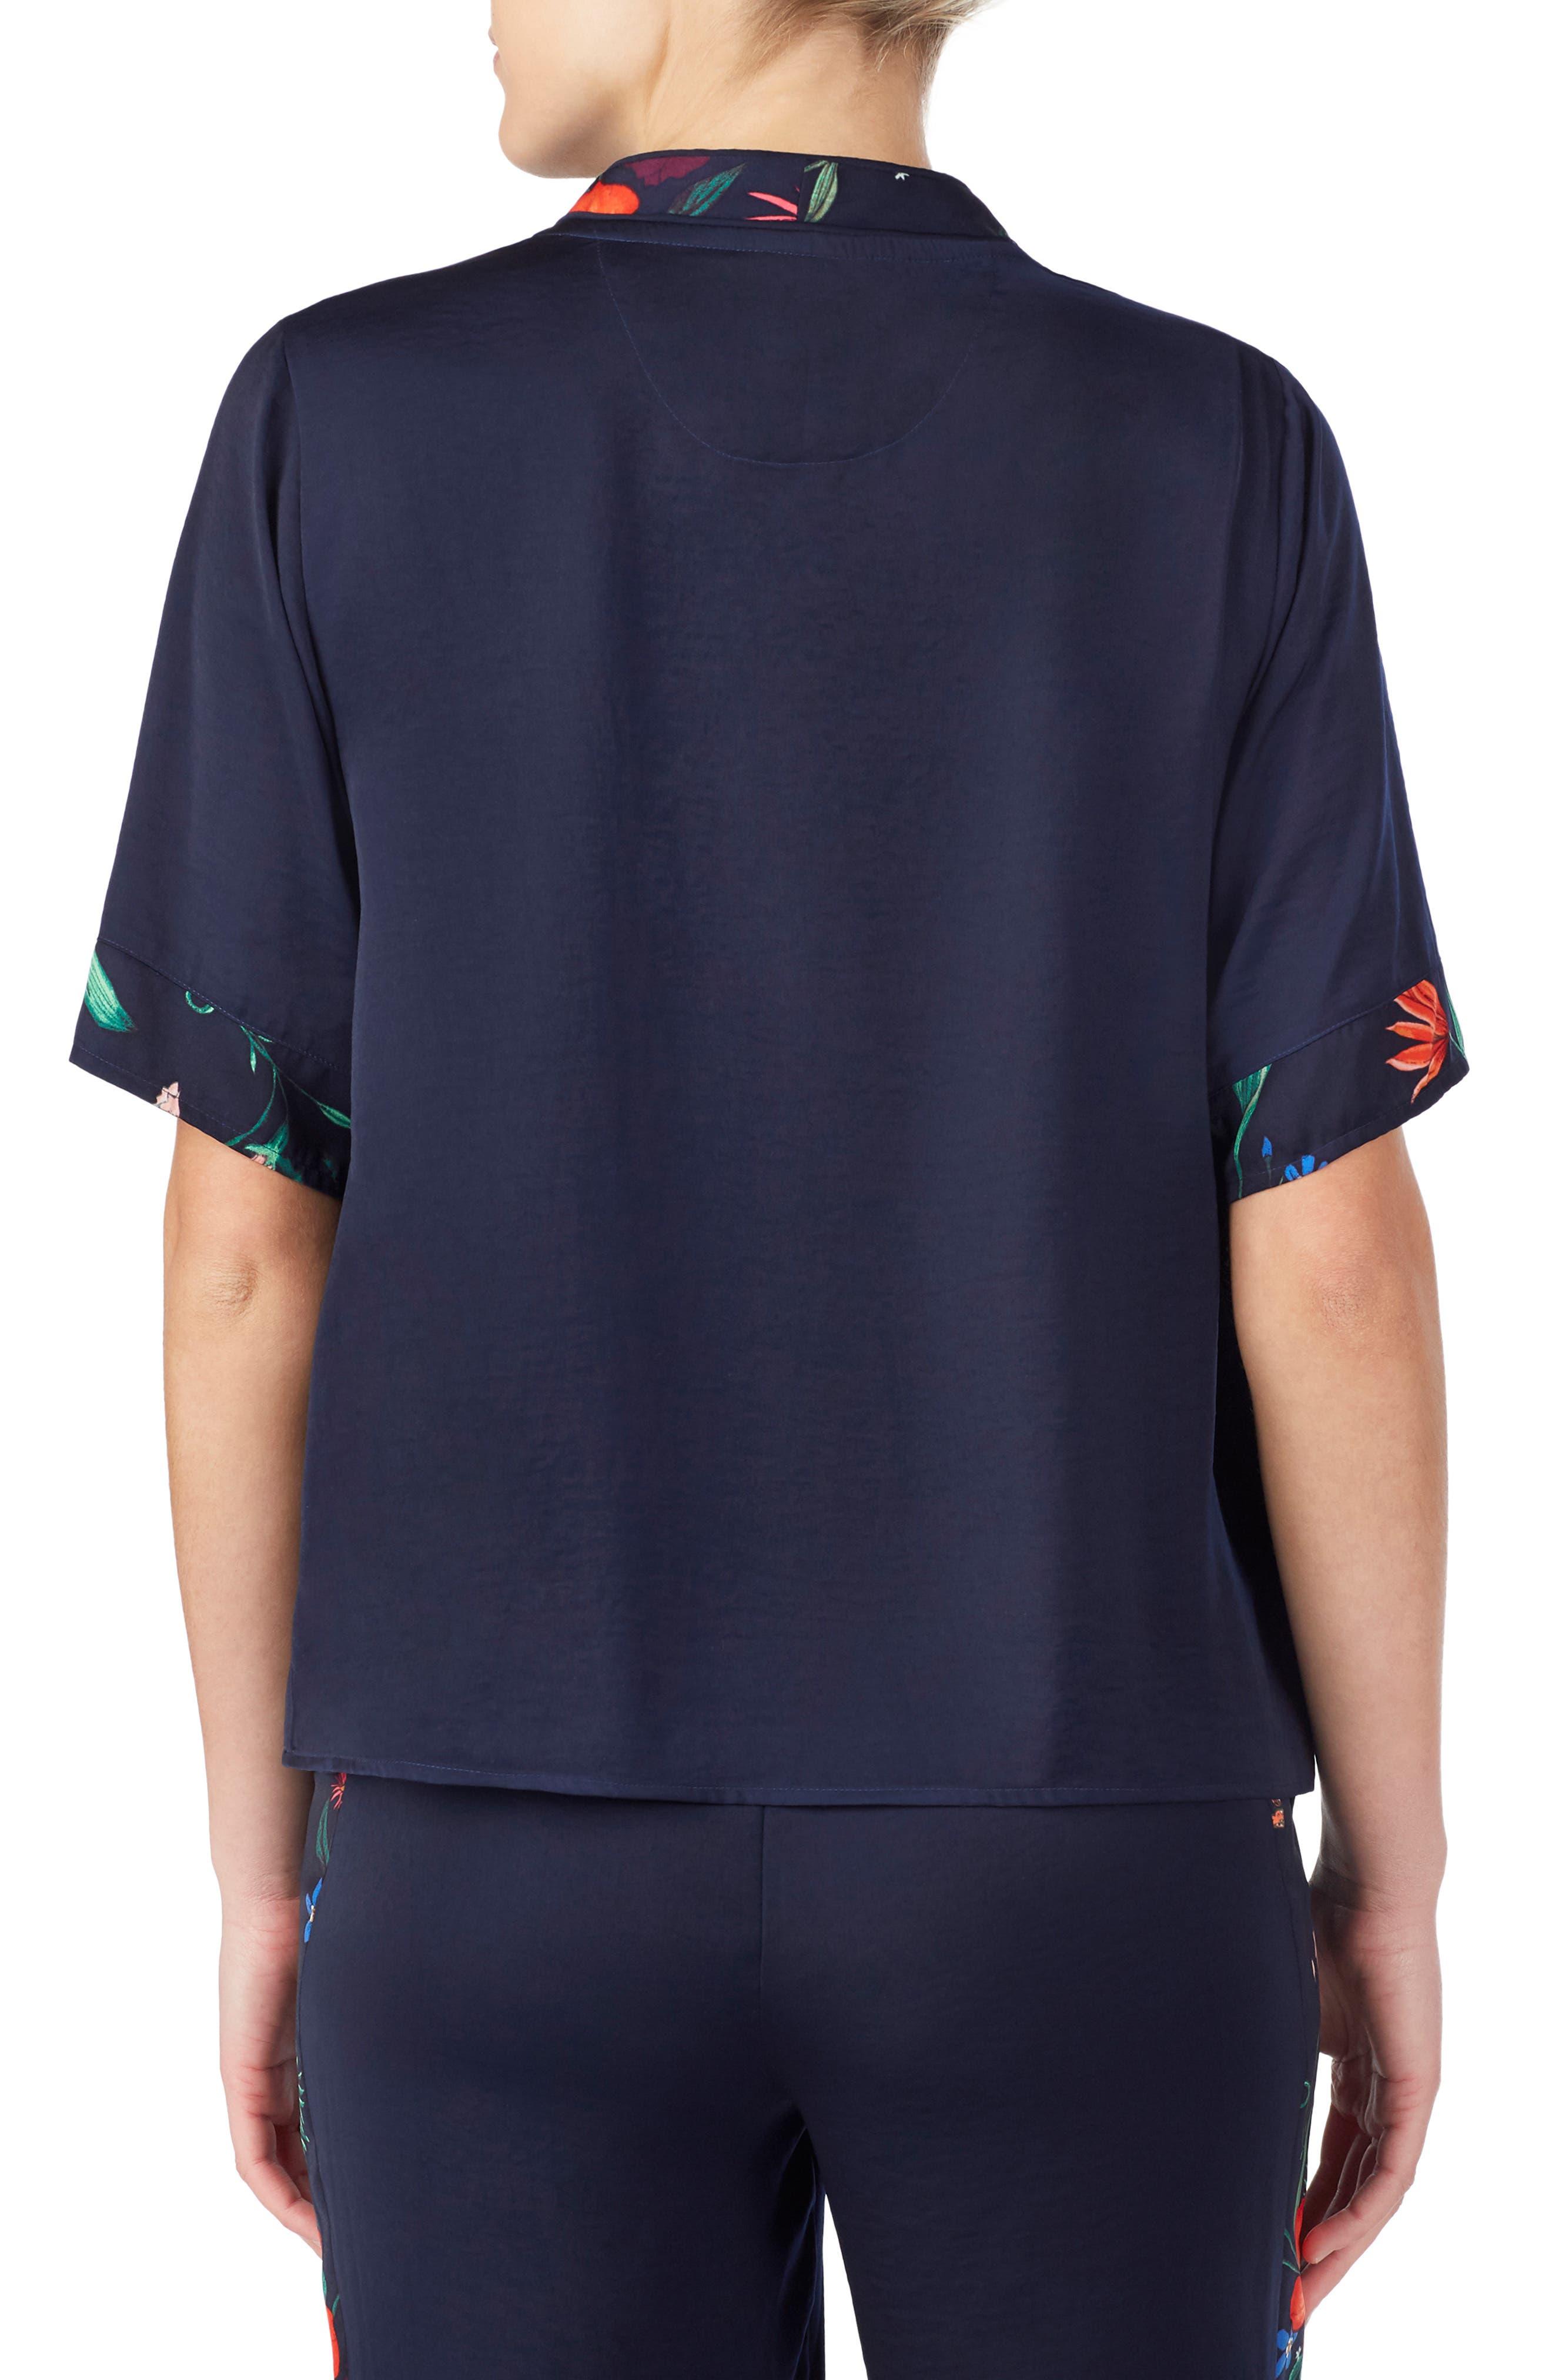 Room Service Floral Button Pajama Top